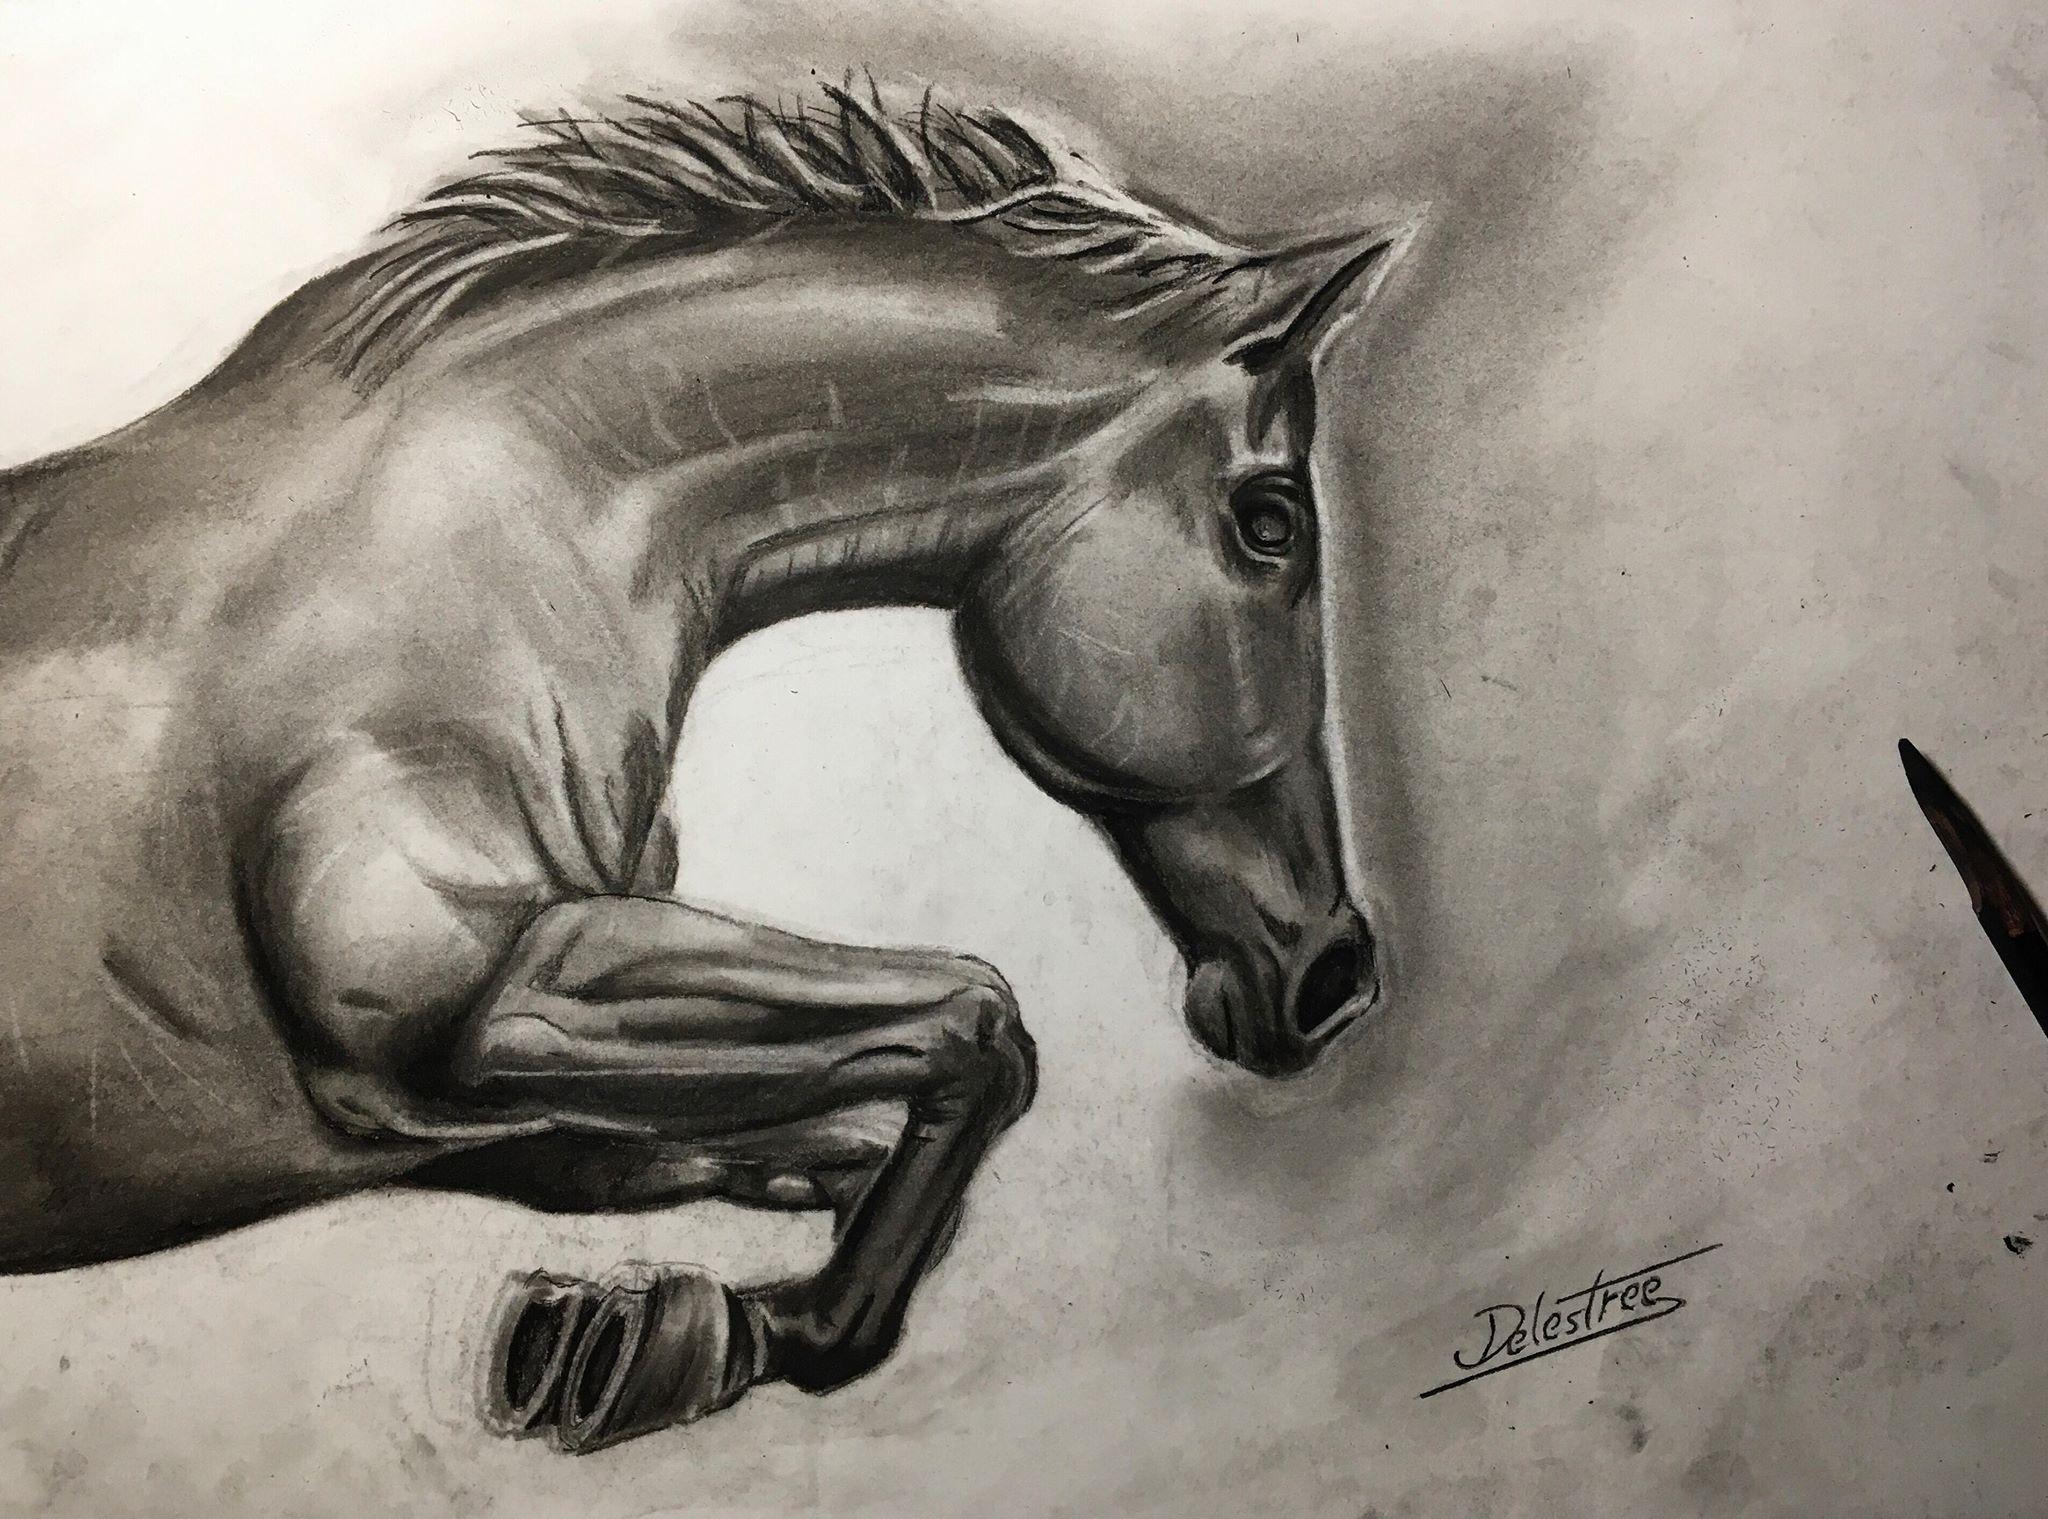 Dessin Horse charcoal de JohannDelestree